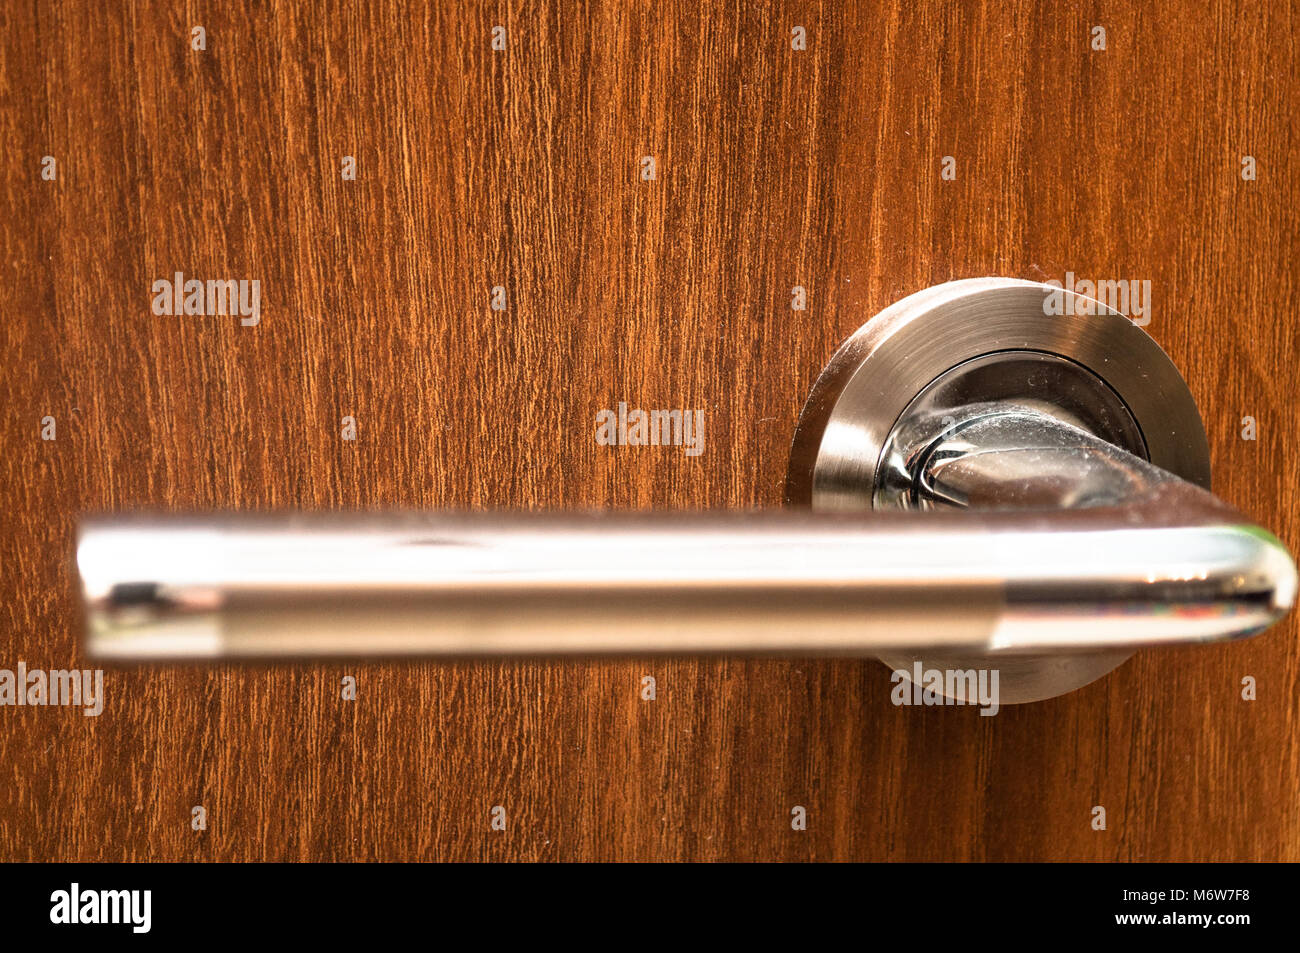 Handle and wooden door close up. Nice and elegant wooden door with silver handle. - Stock Image